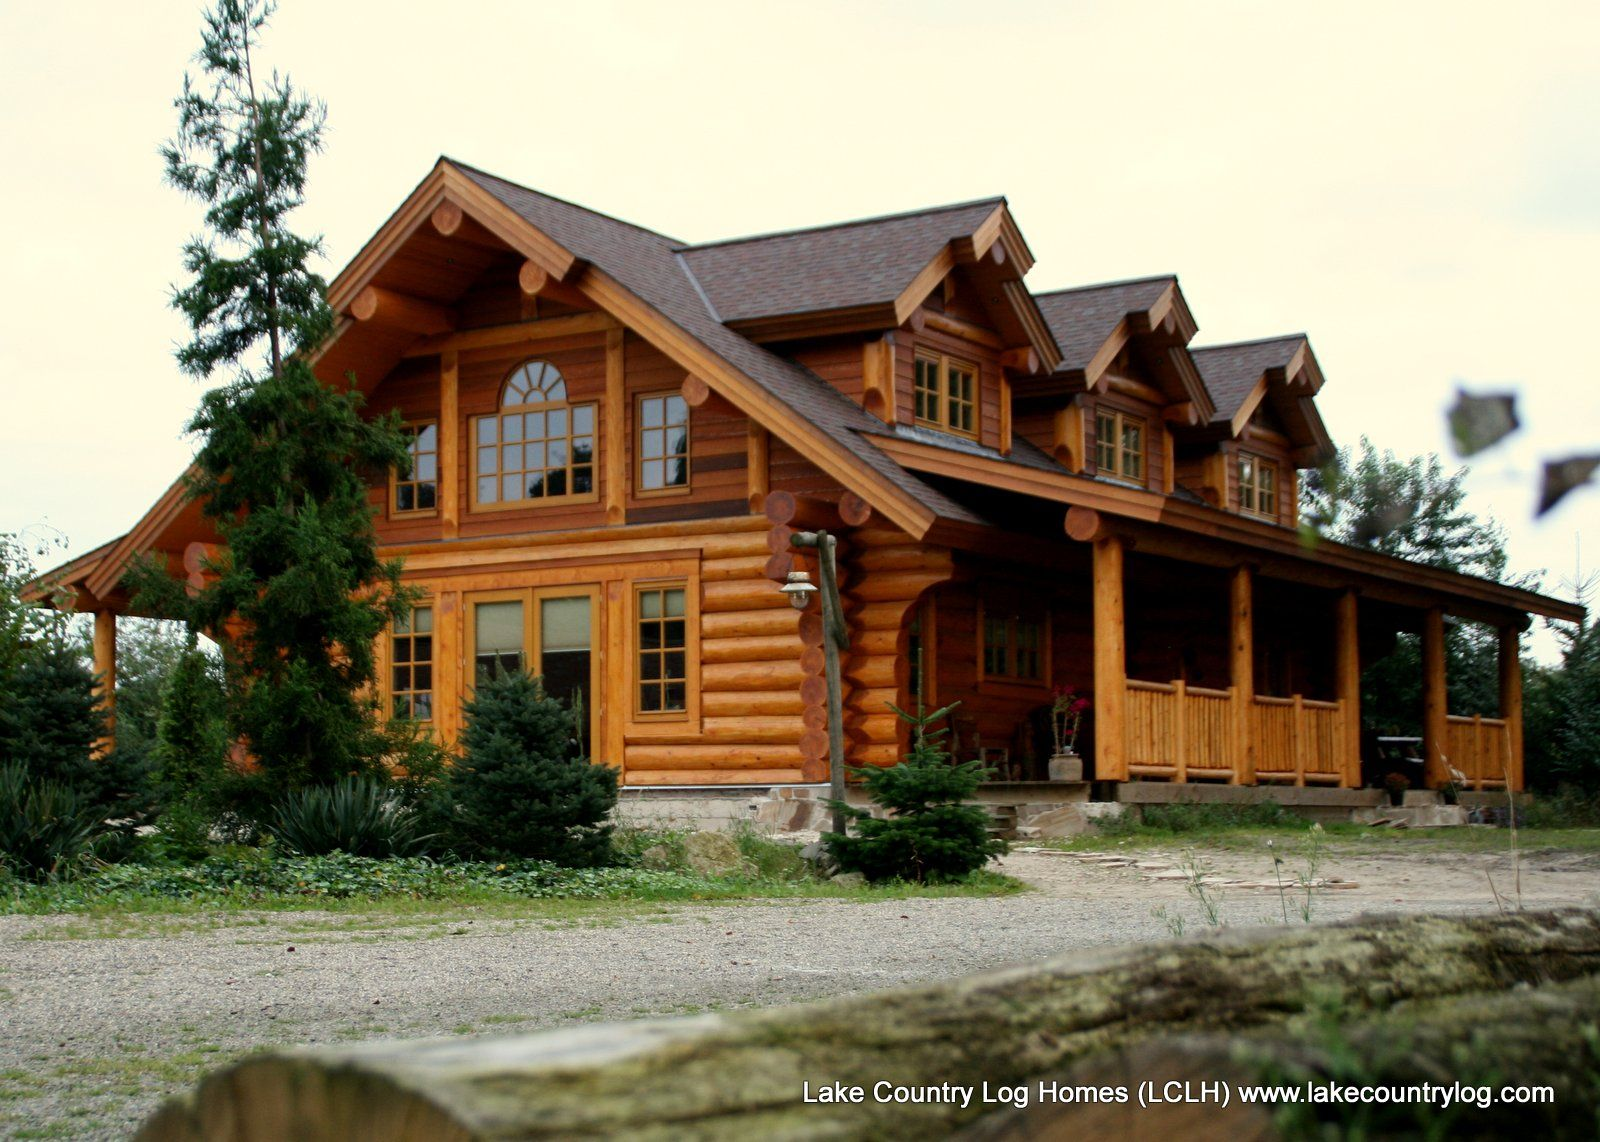 Cedar Log Homes ~ Lakecountrylog custom handcrafted western red